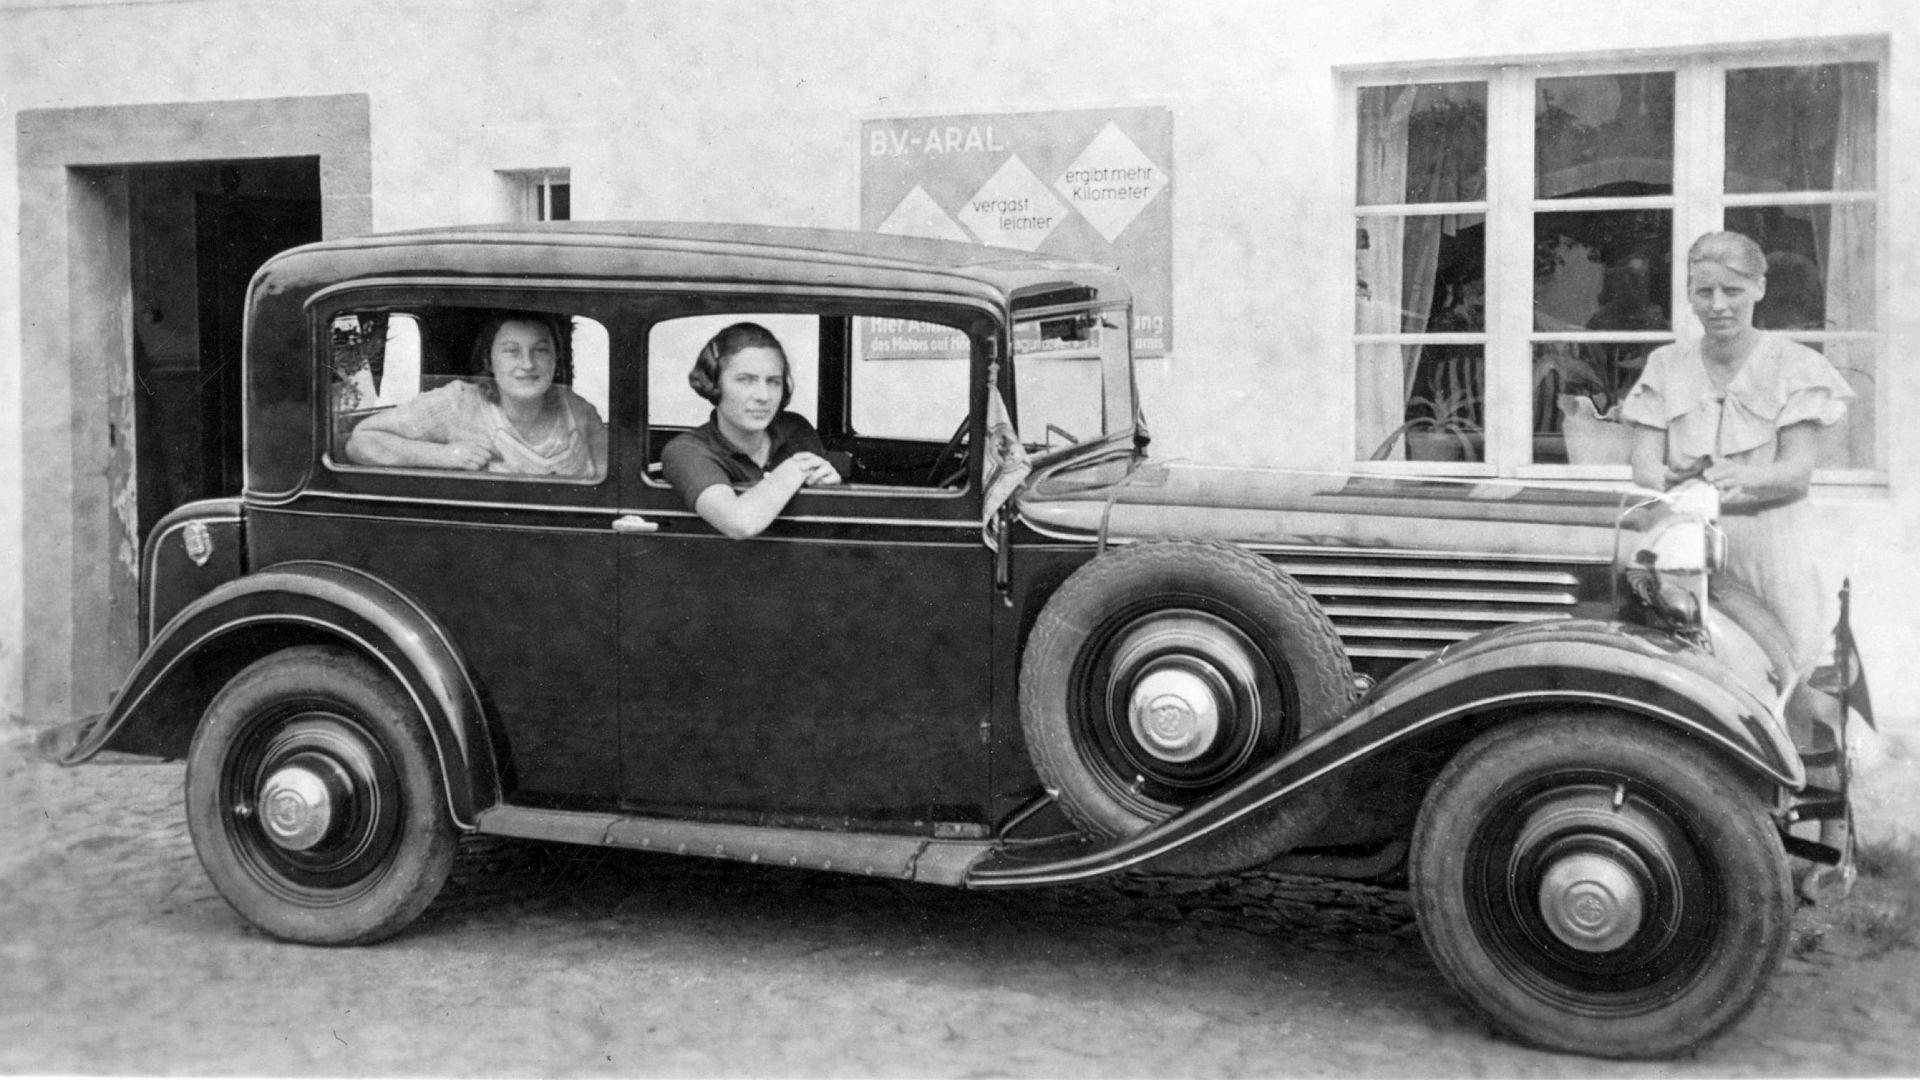 Stoewer_R-140_2-türige_Limousine_Sommer_1933_Galerie